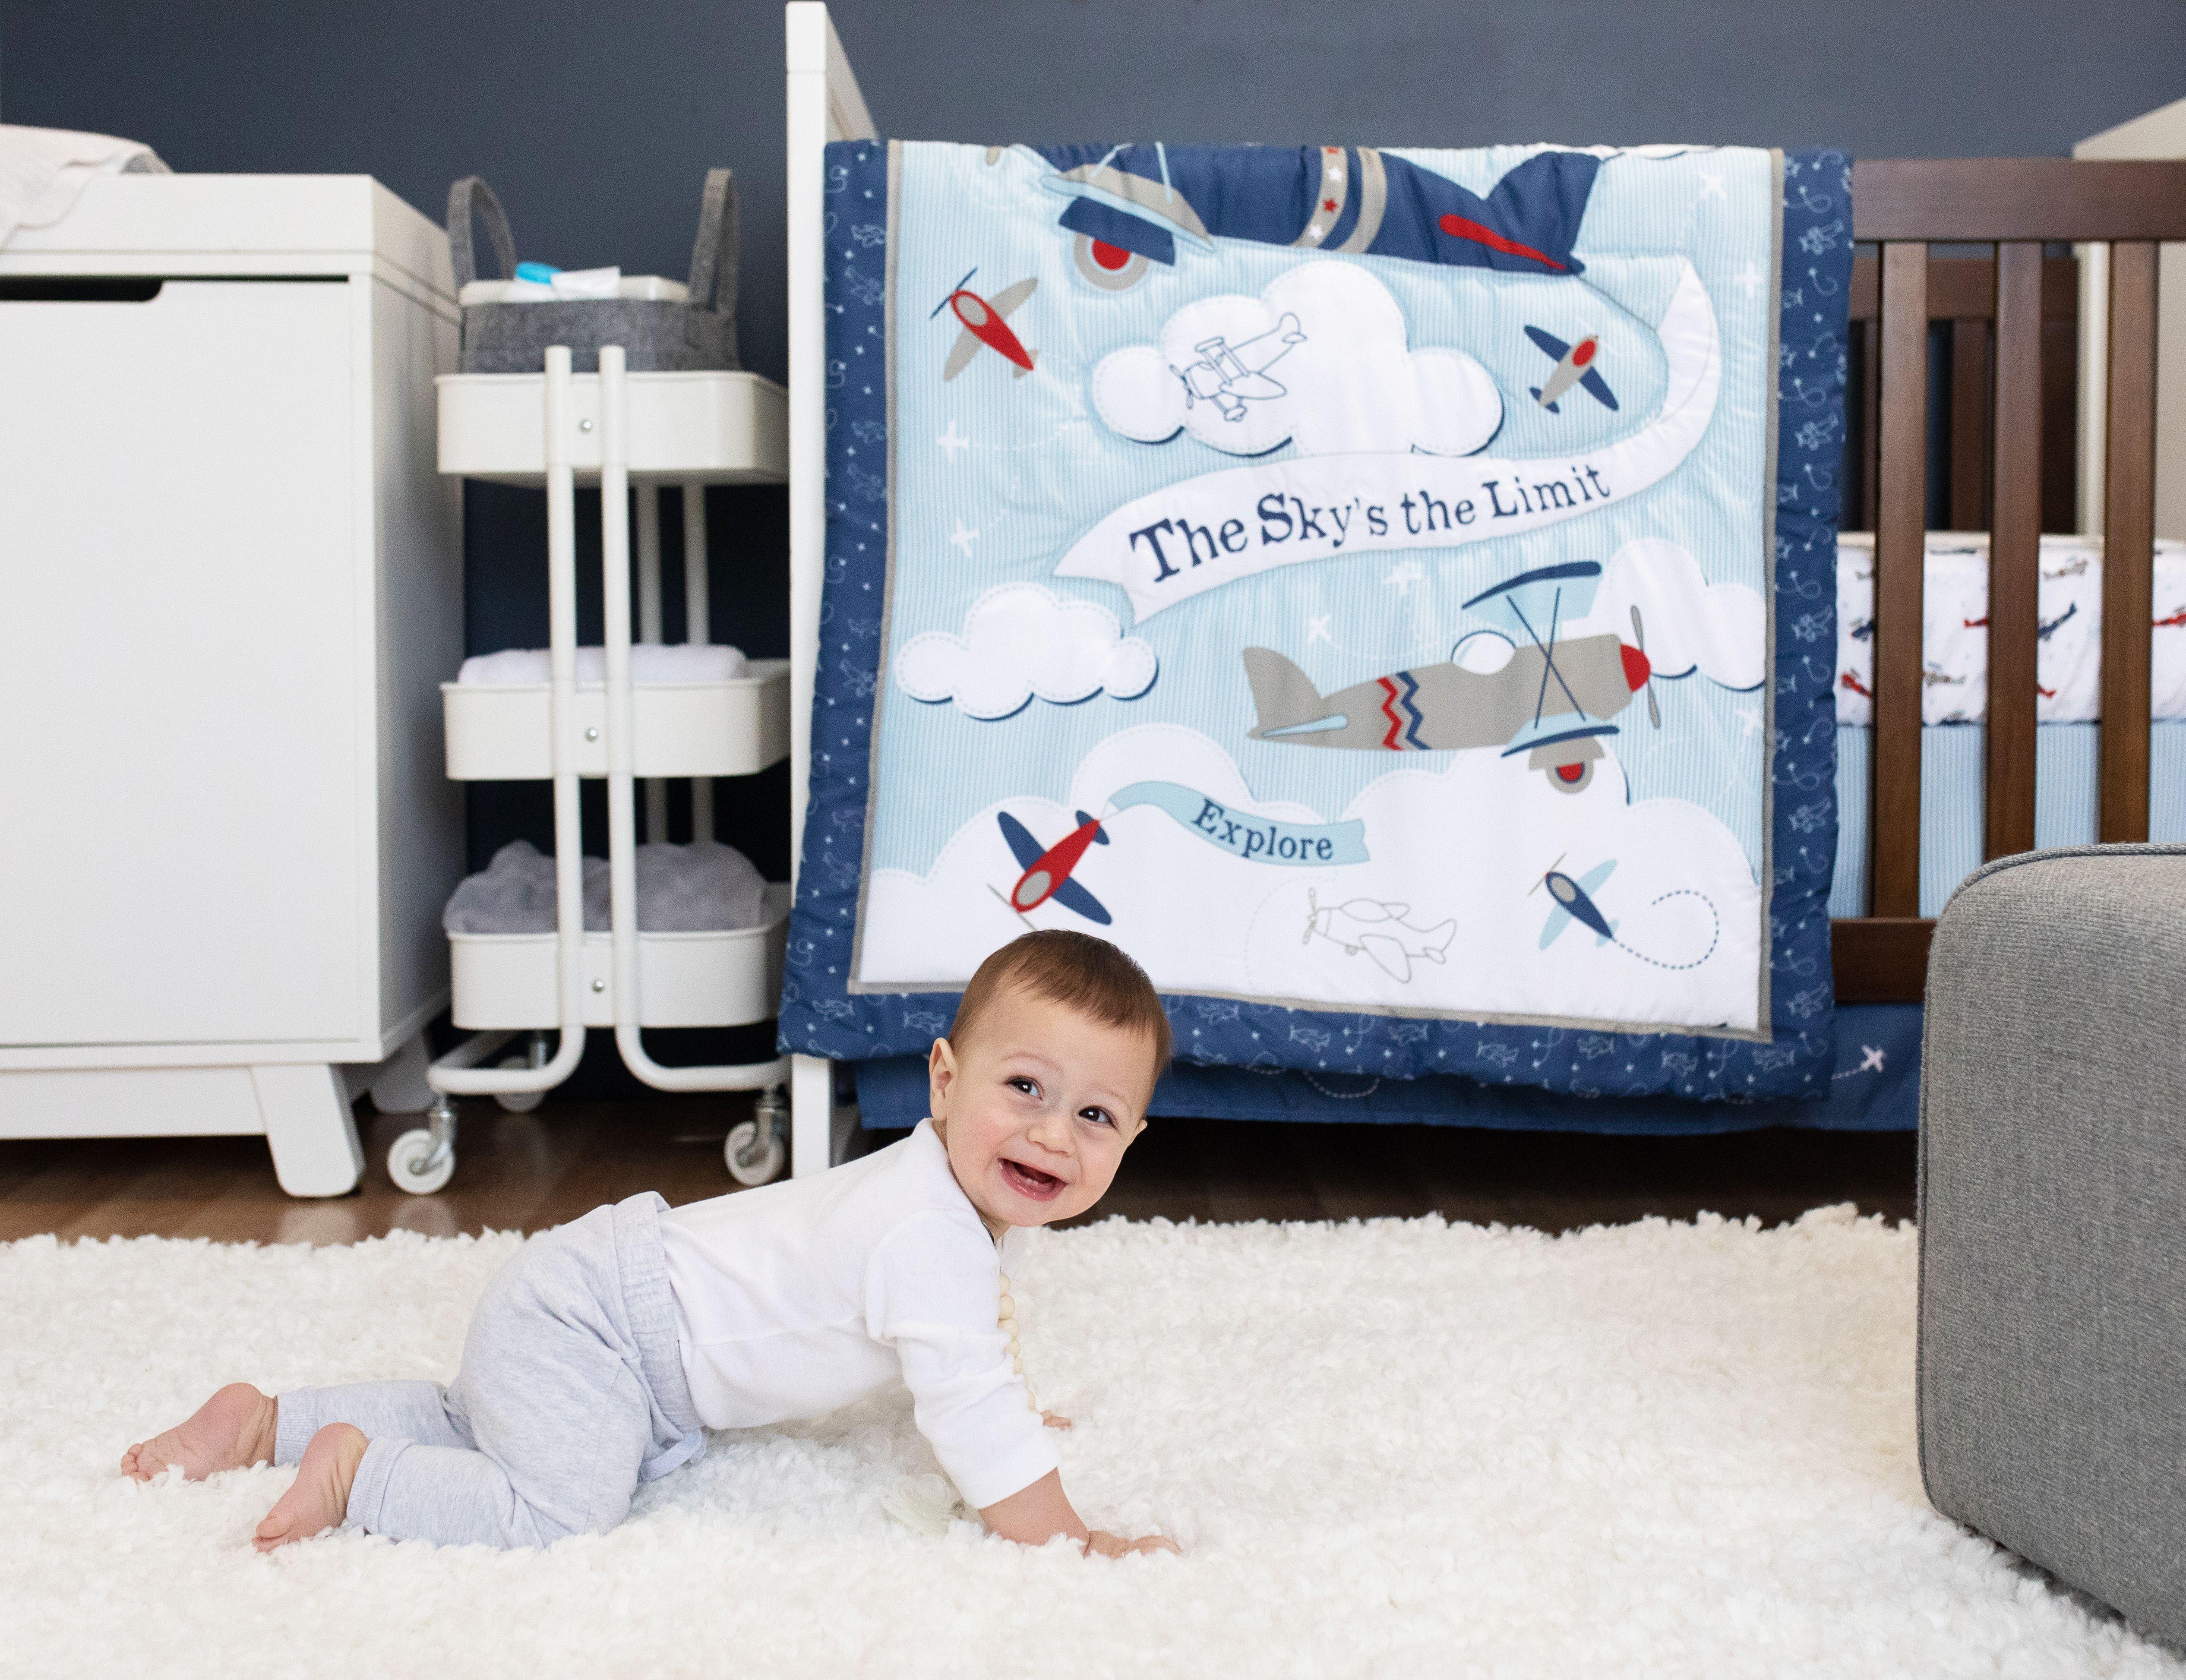 Crib Cloud Crib Sheet Adventure Crib Bedding Baby Boy Crib Sheet Baby Boy Nursery Arrow Mountain Crib Sheet Explorer Baby Boy Gift